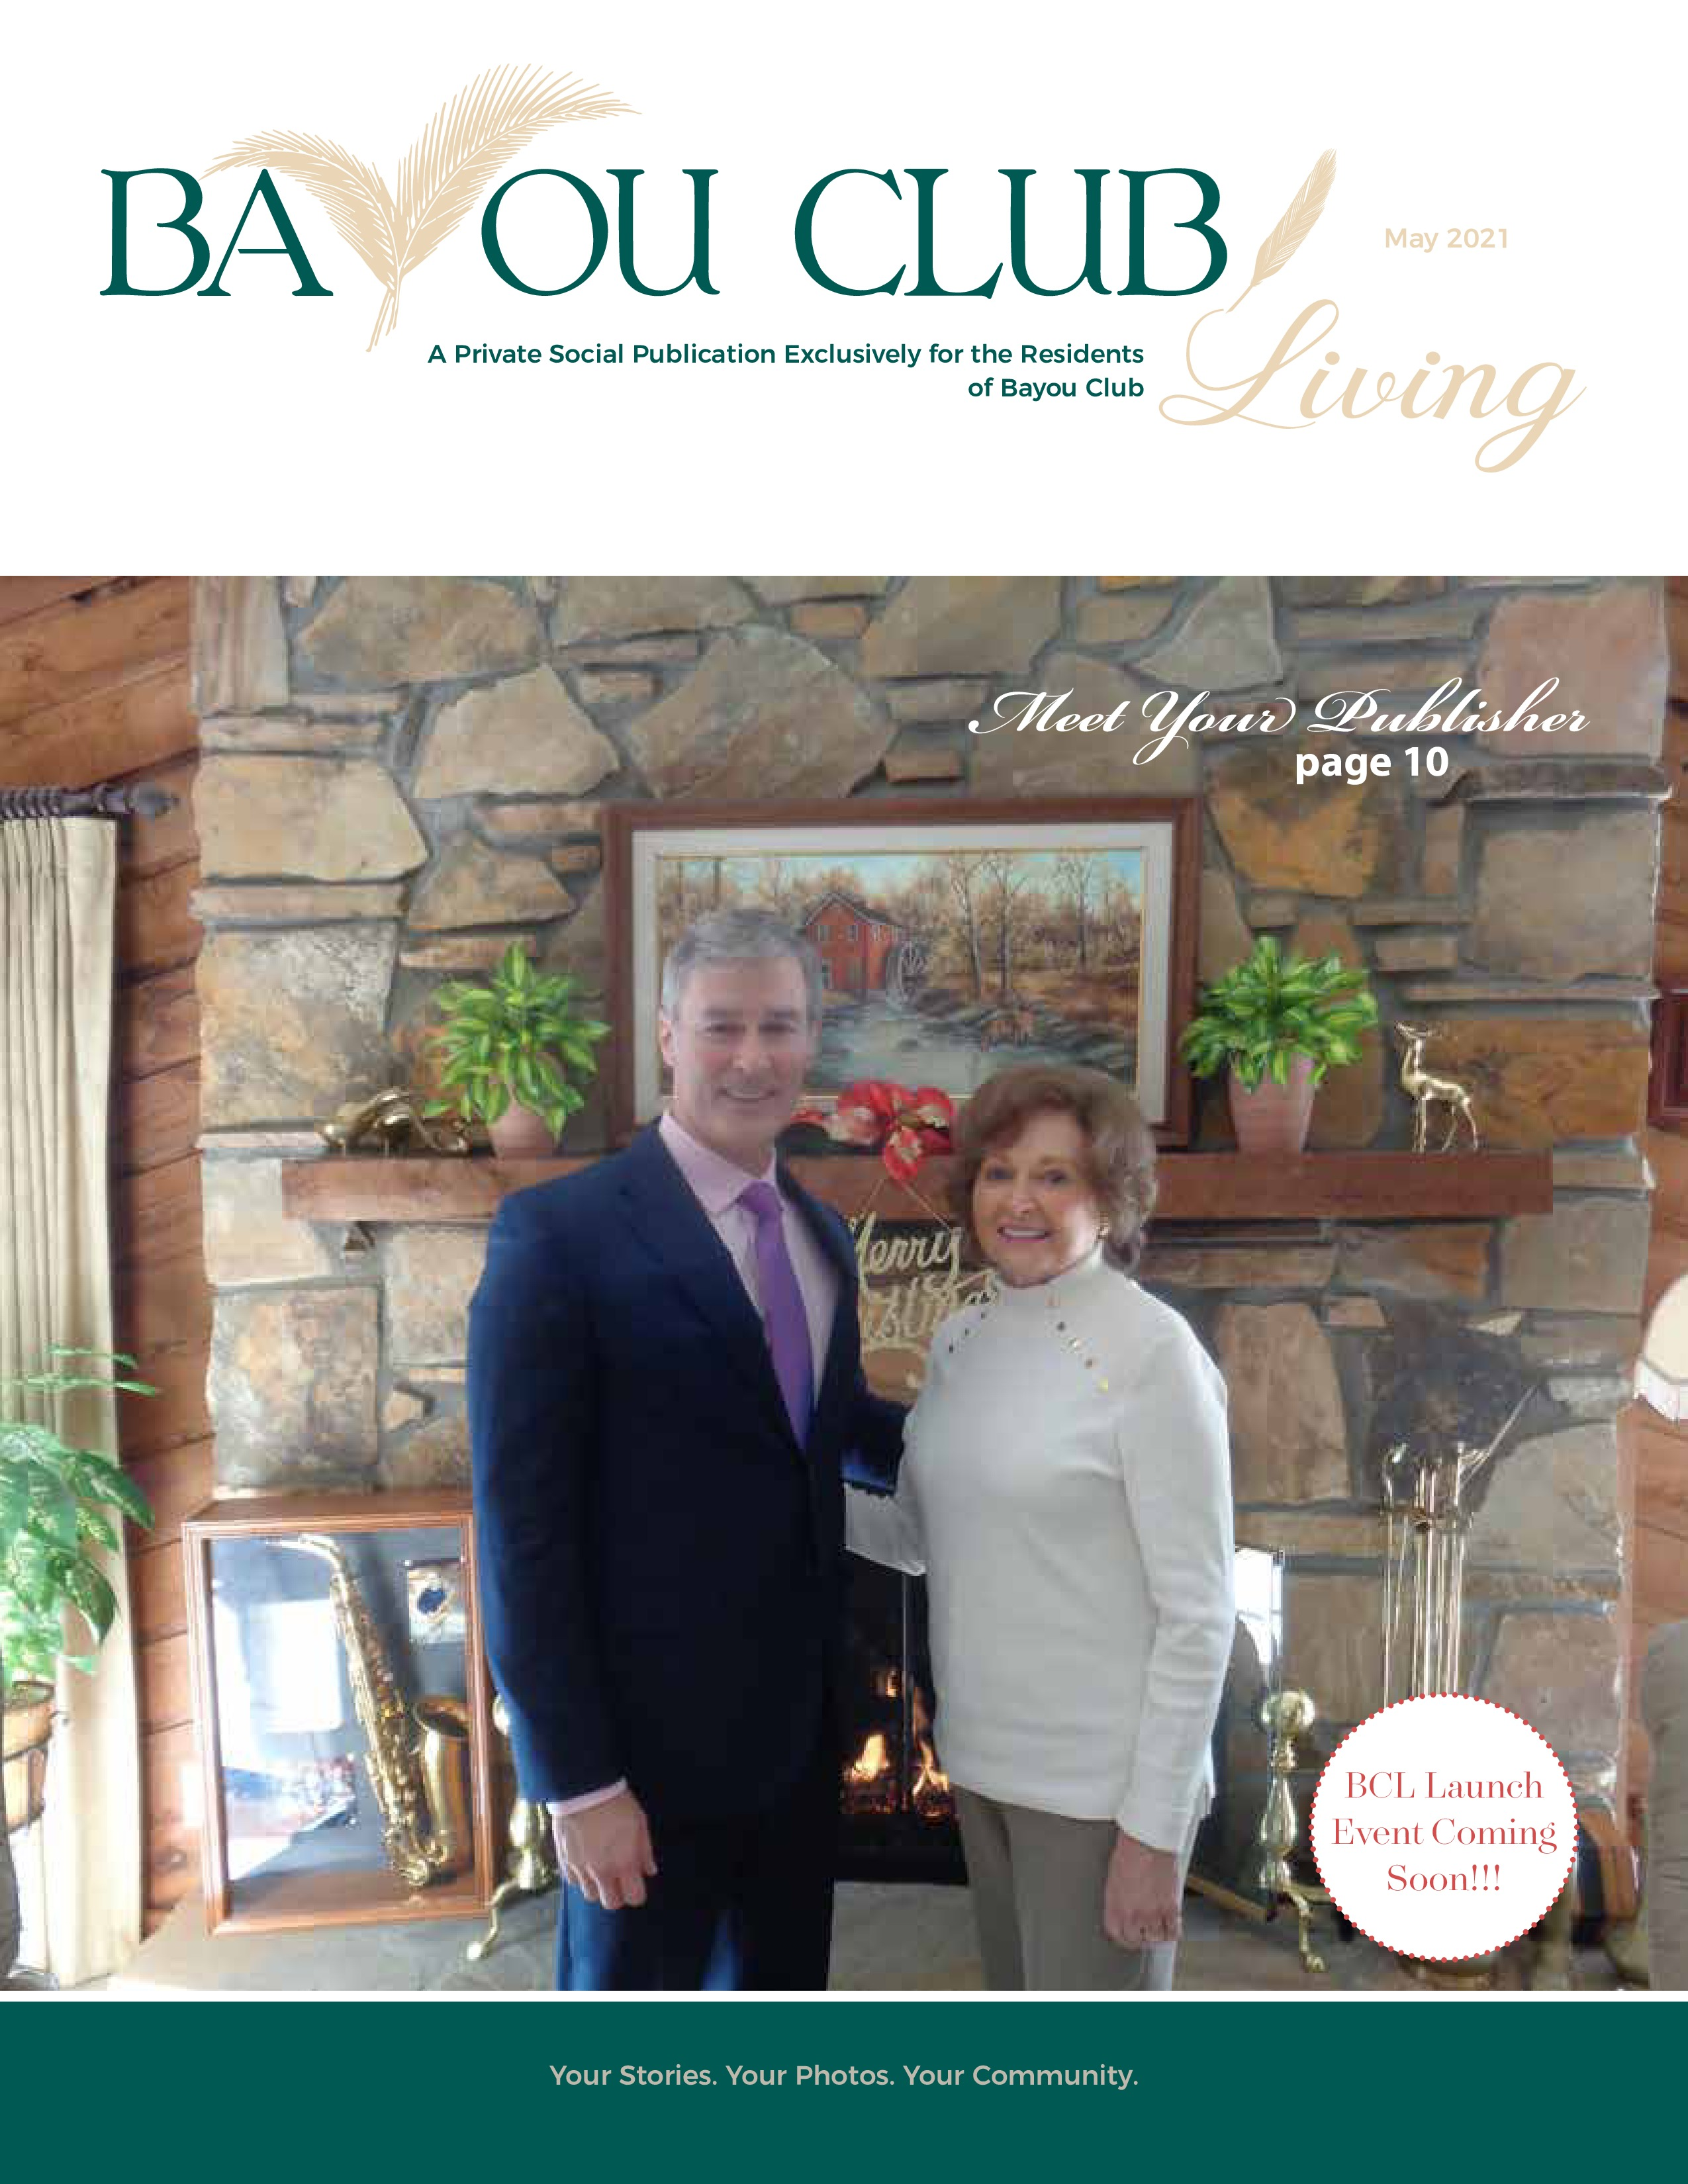 Bayou Club Living 2021-05-01